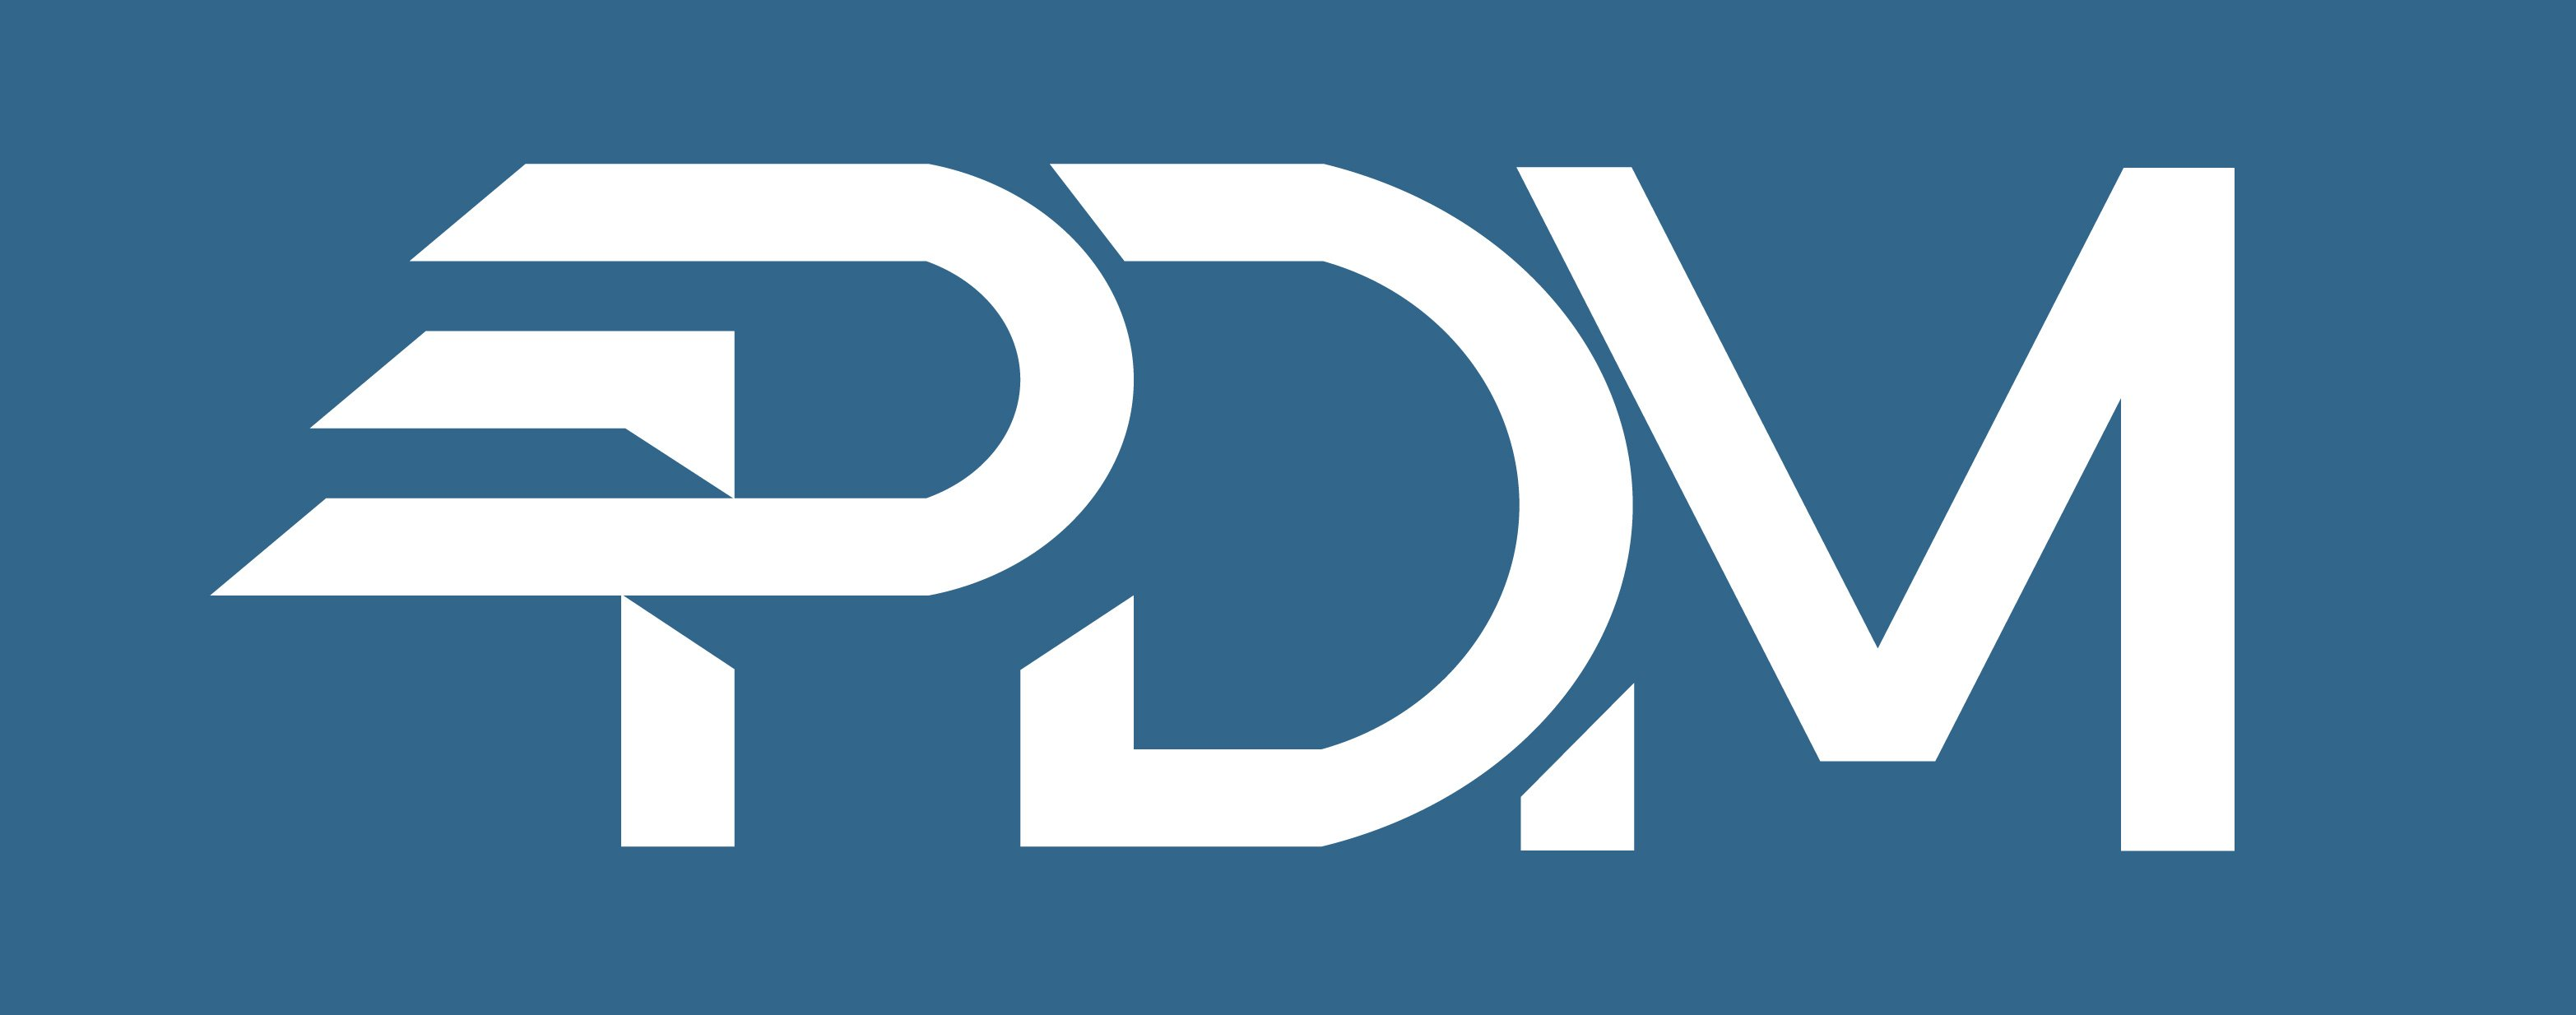 PDM Logo Files-white on blue